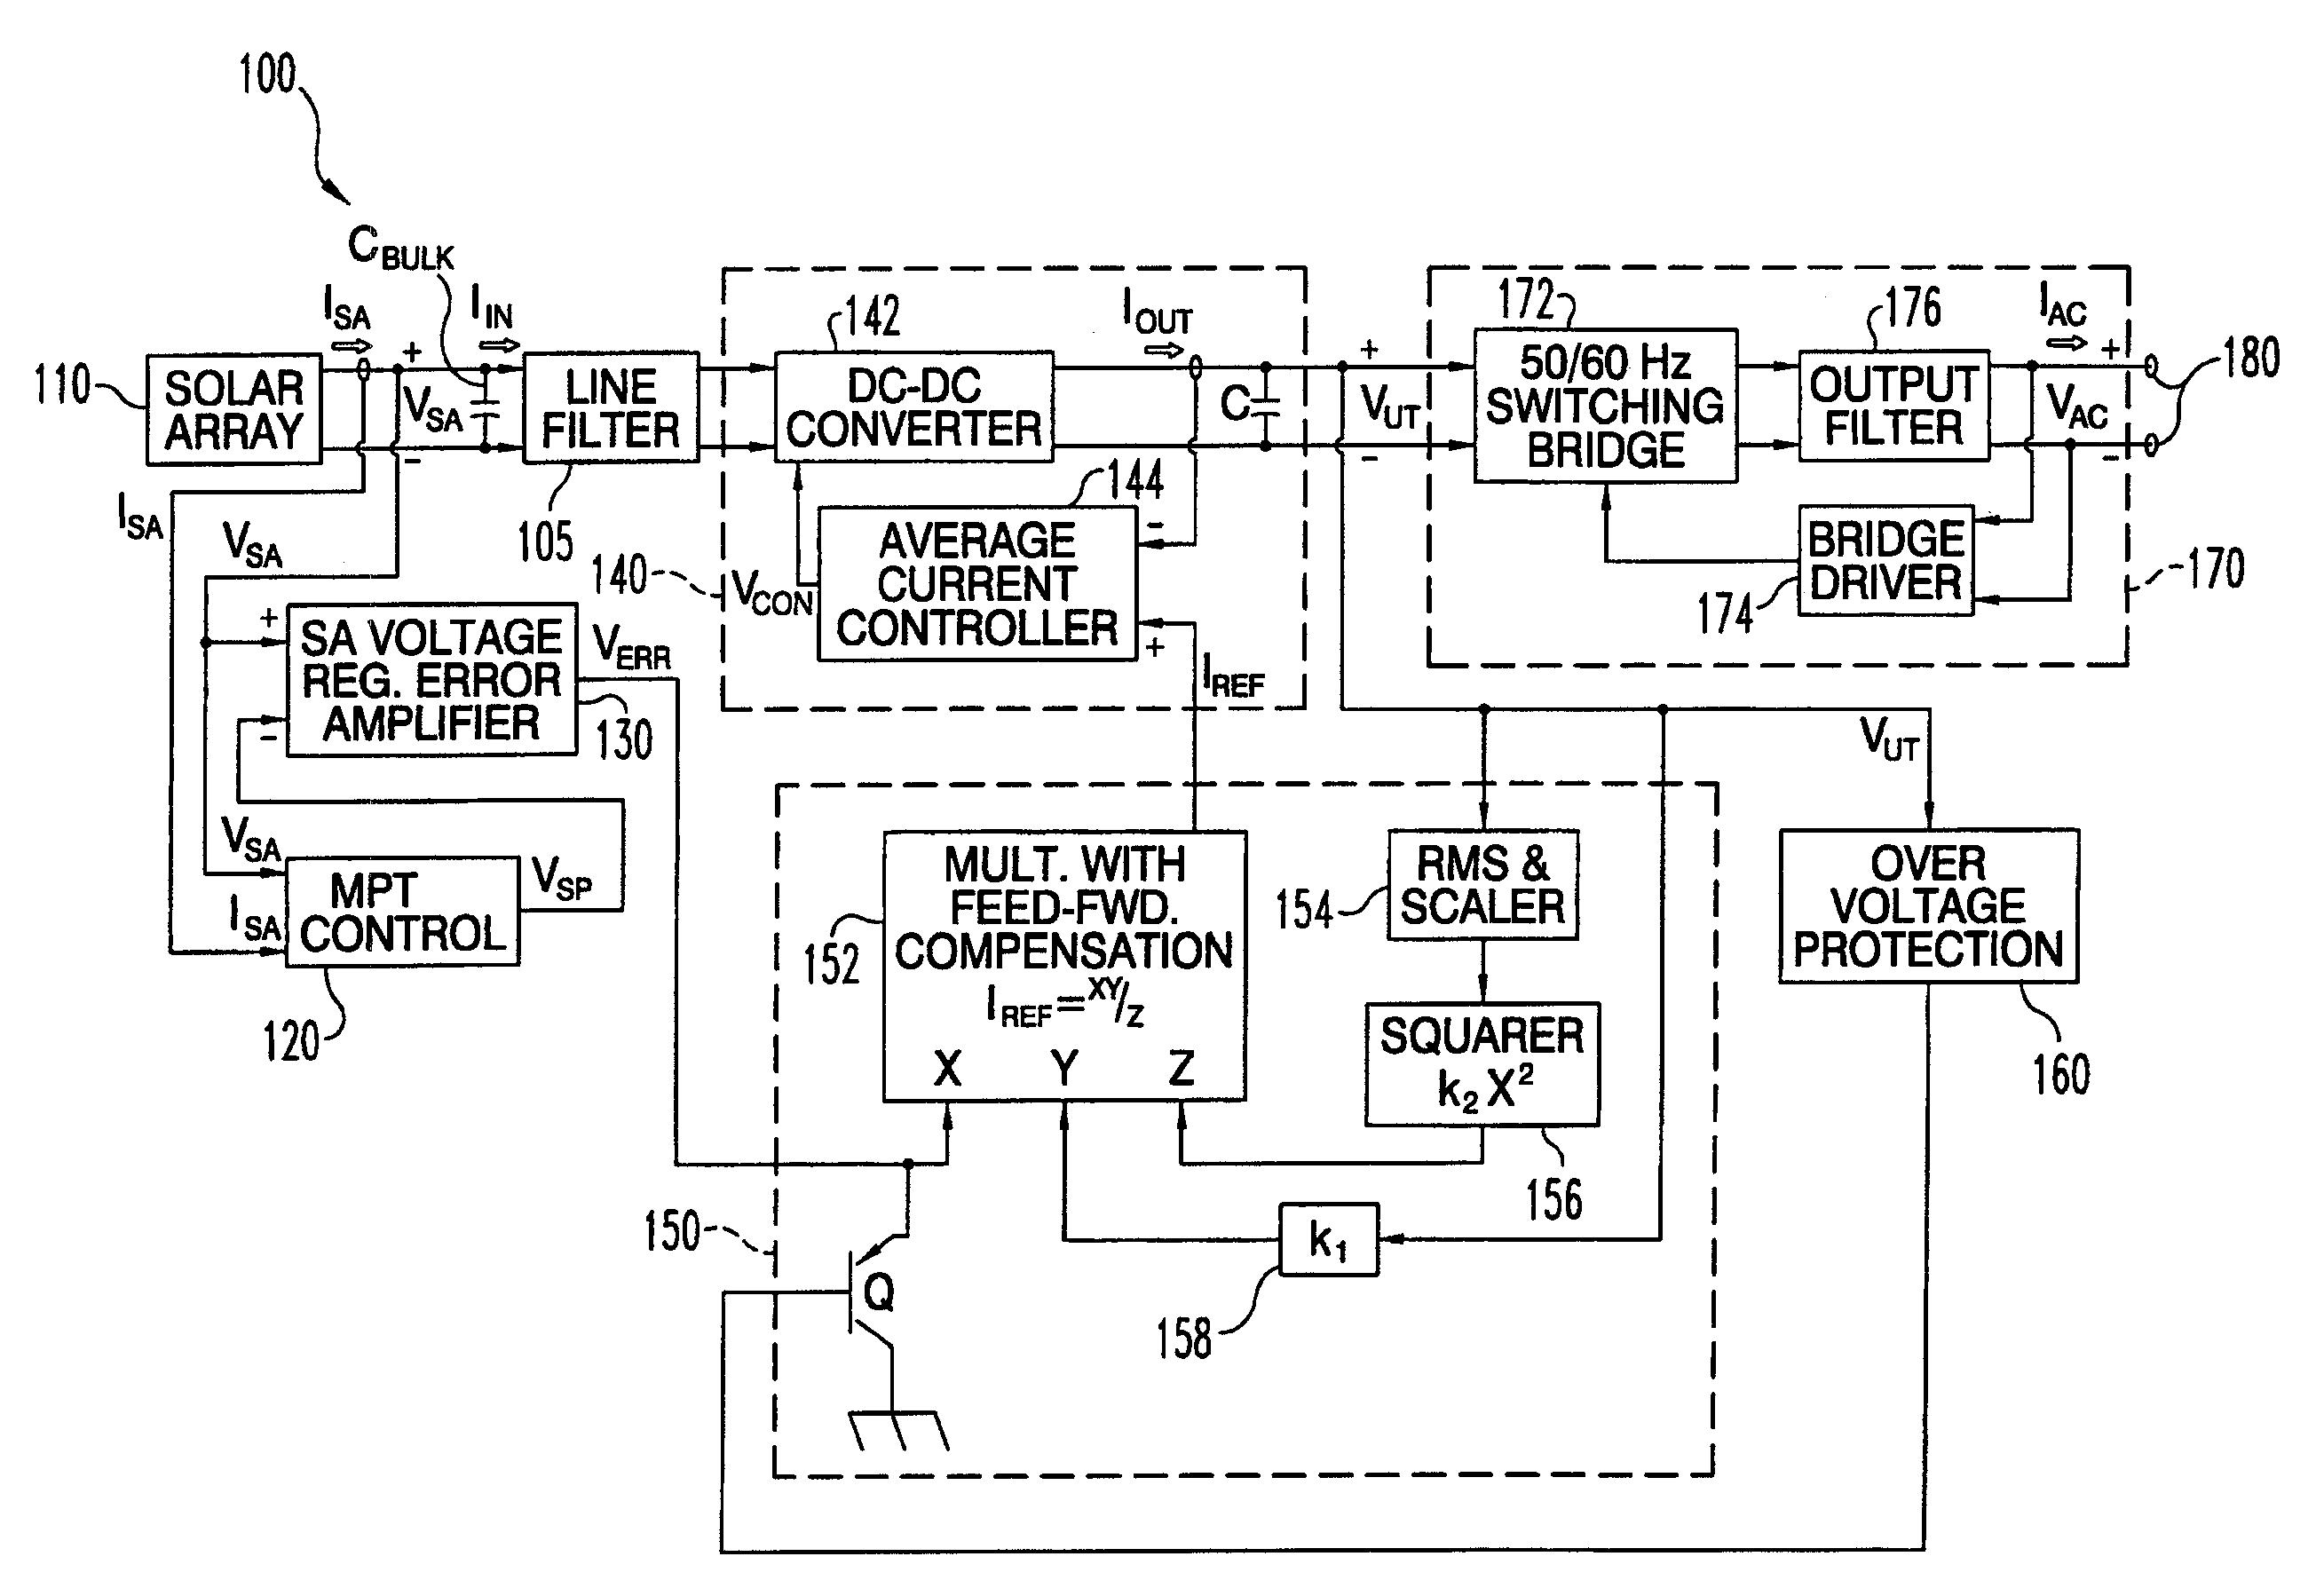 bipolar pv module wiring diagram sony amp wiring diagram